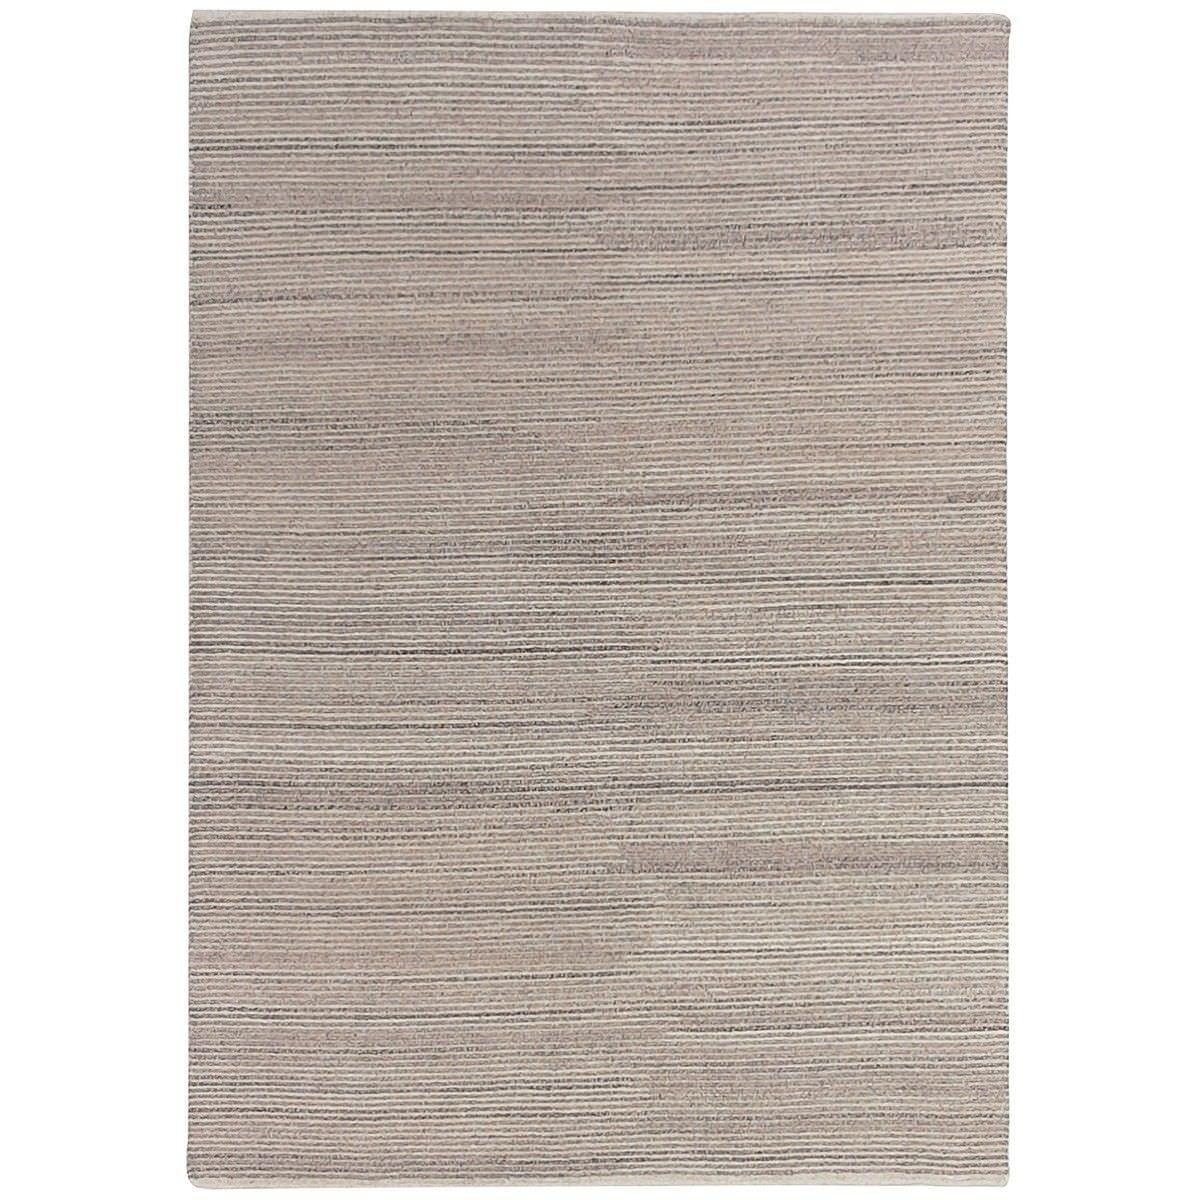 Boheme Hand Tufted Wool Rug, 350x450cm, Natural